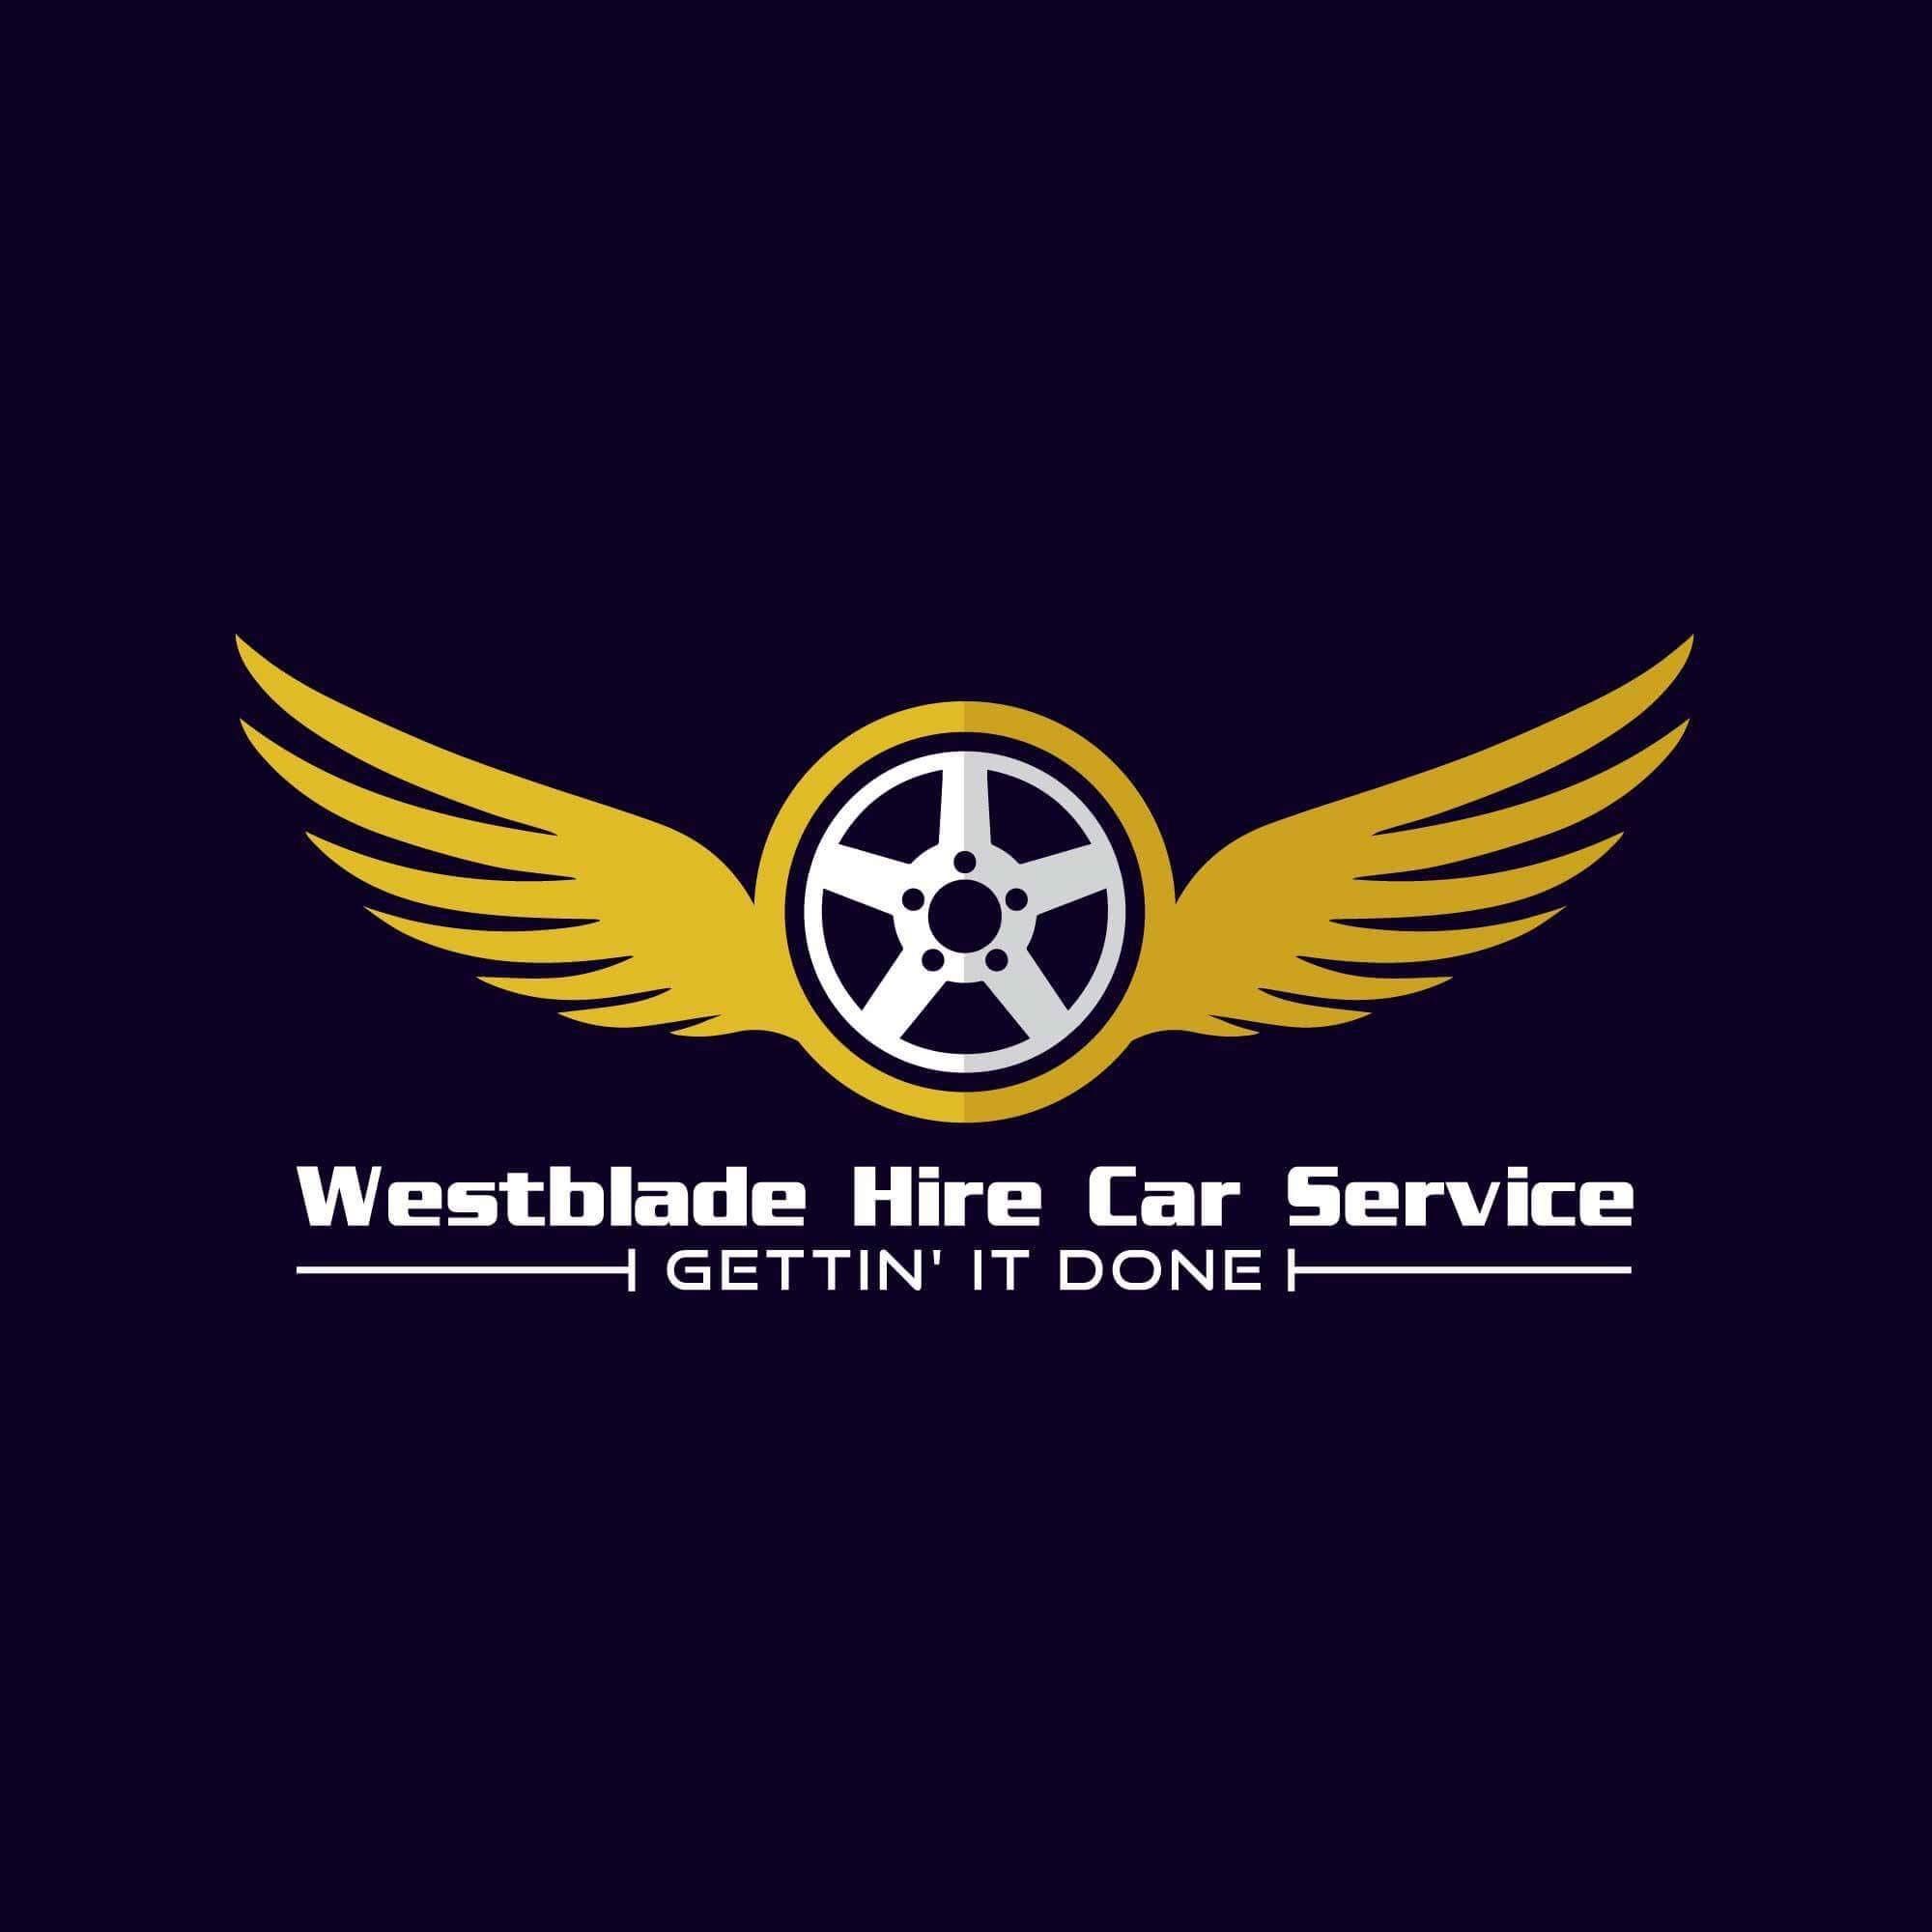 Westblade Hire Car Service